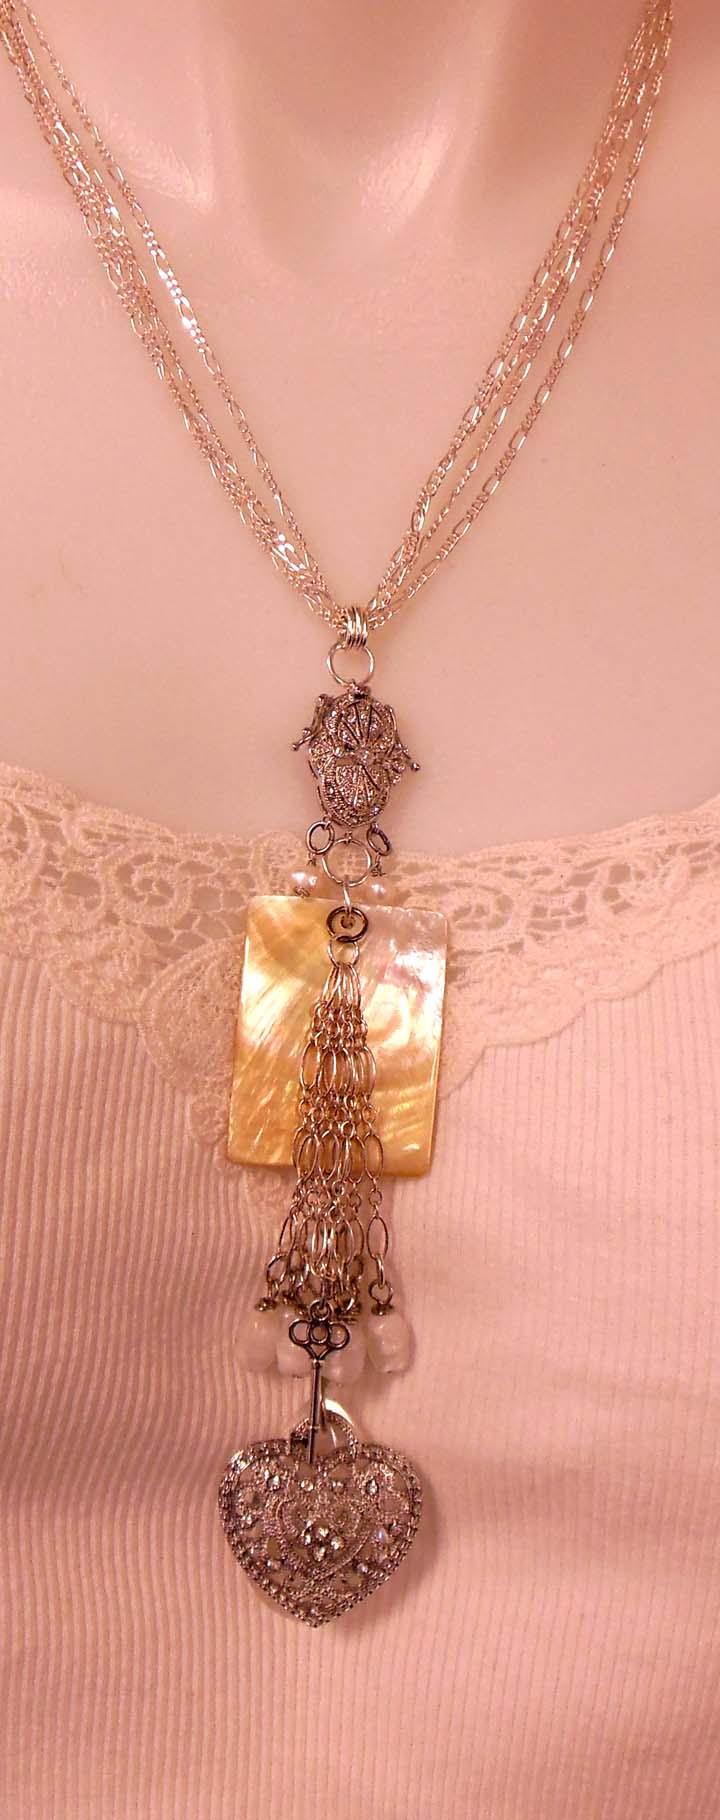 Beadsoupnecklace 001